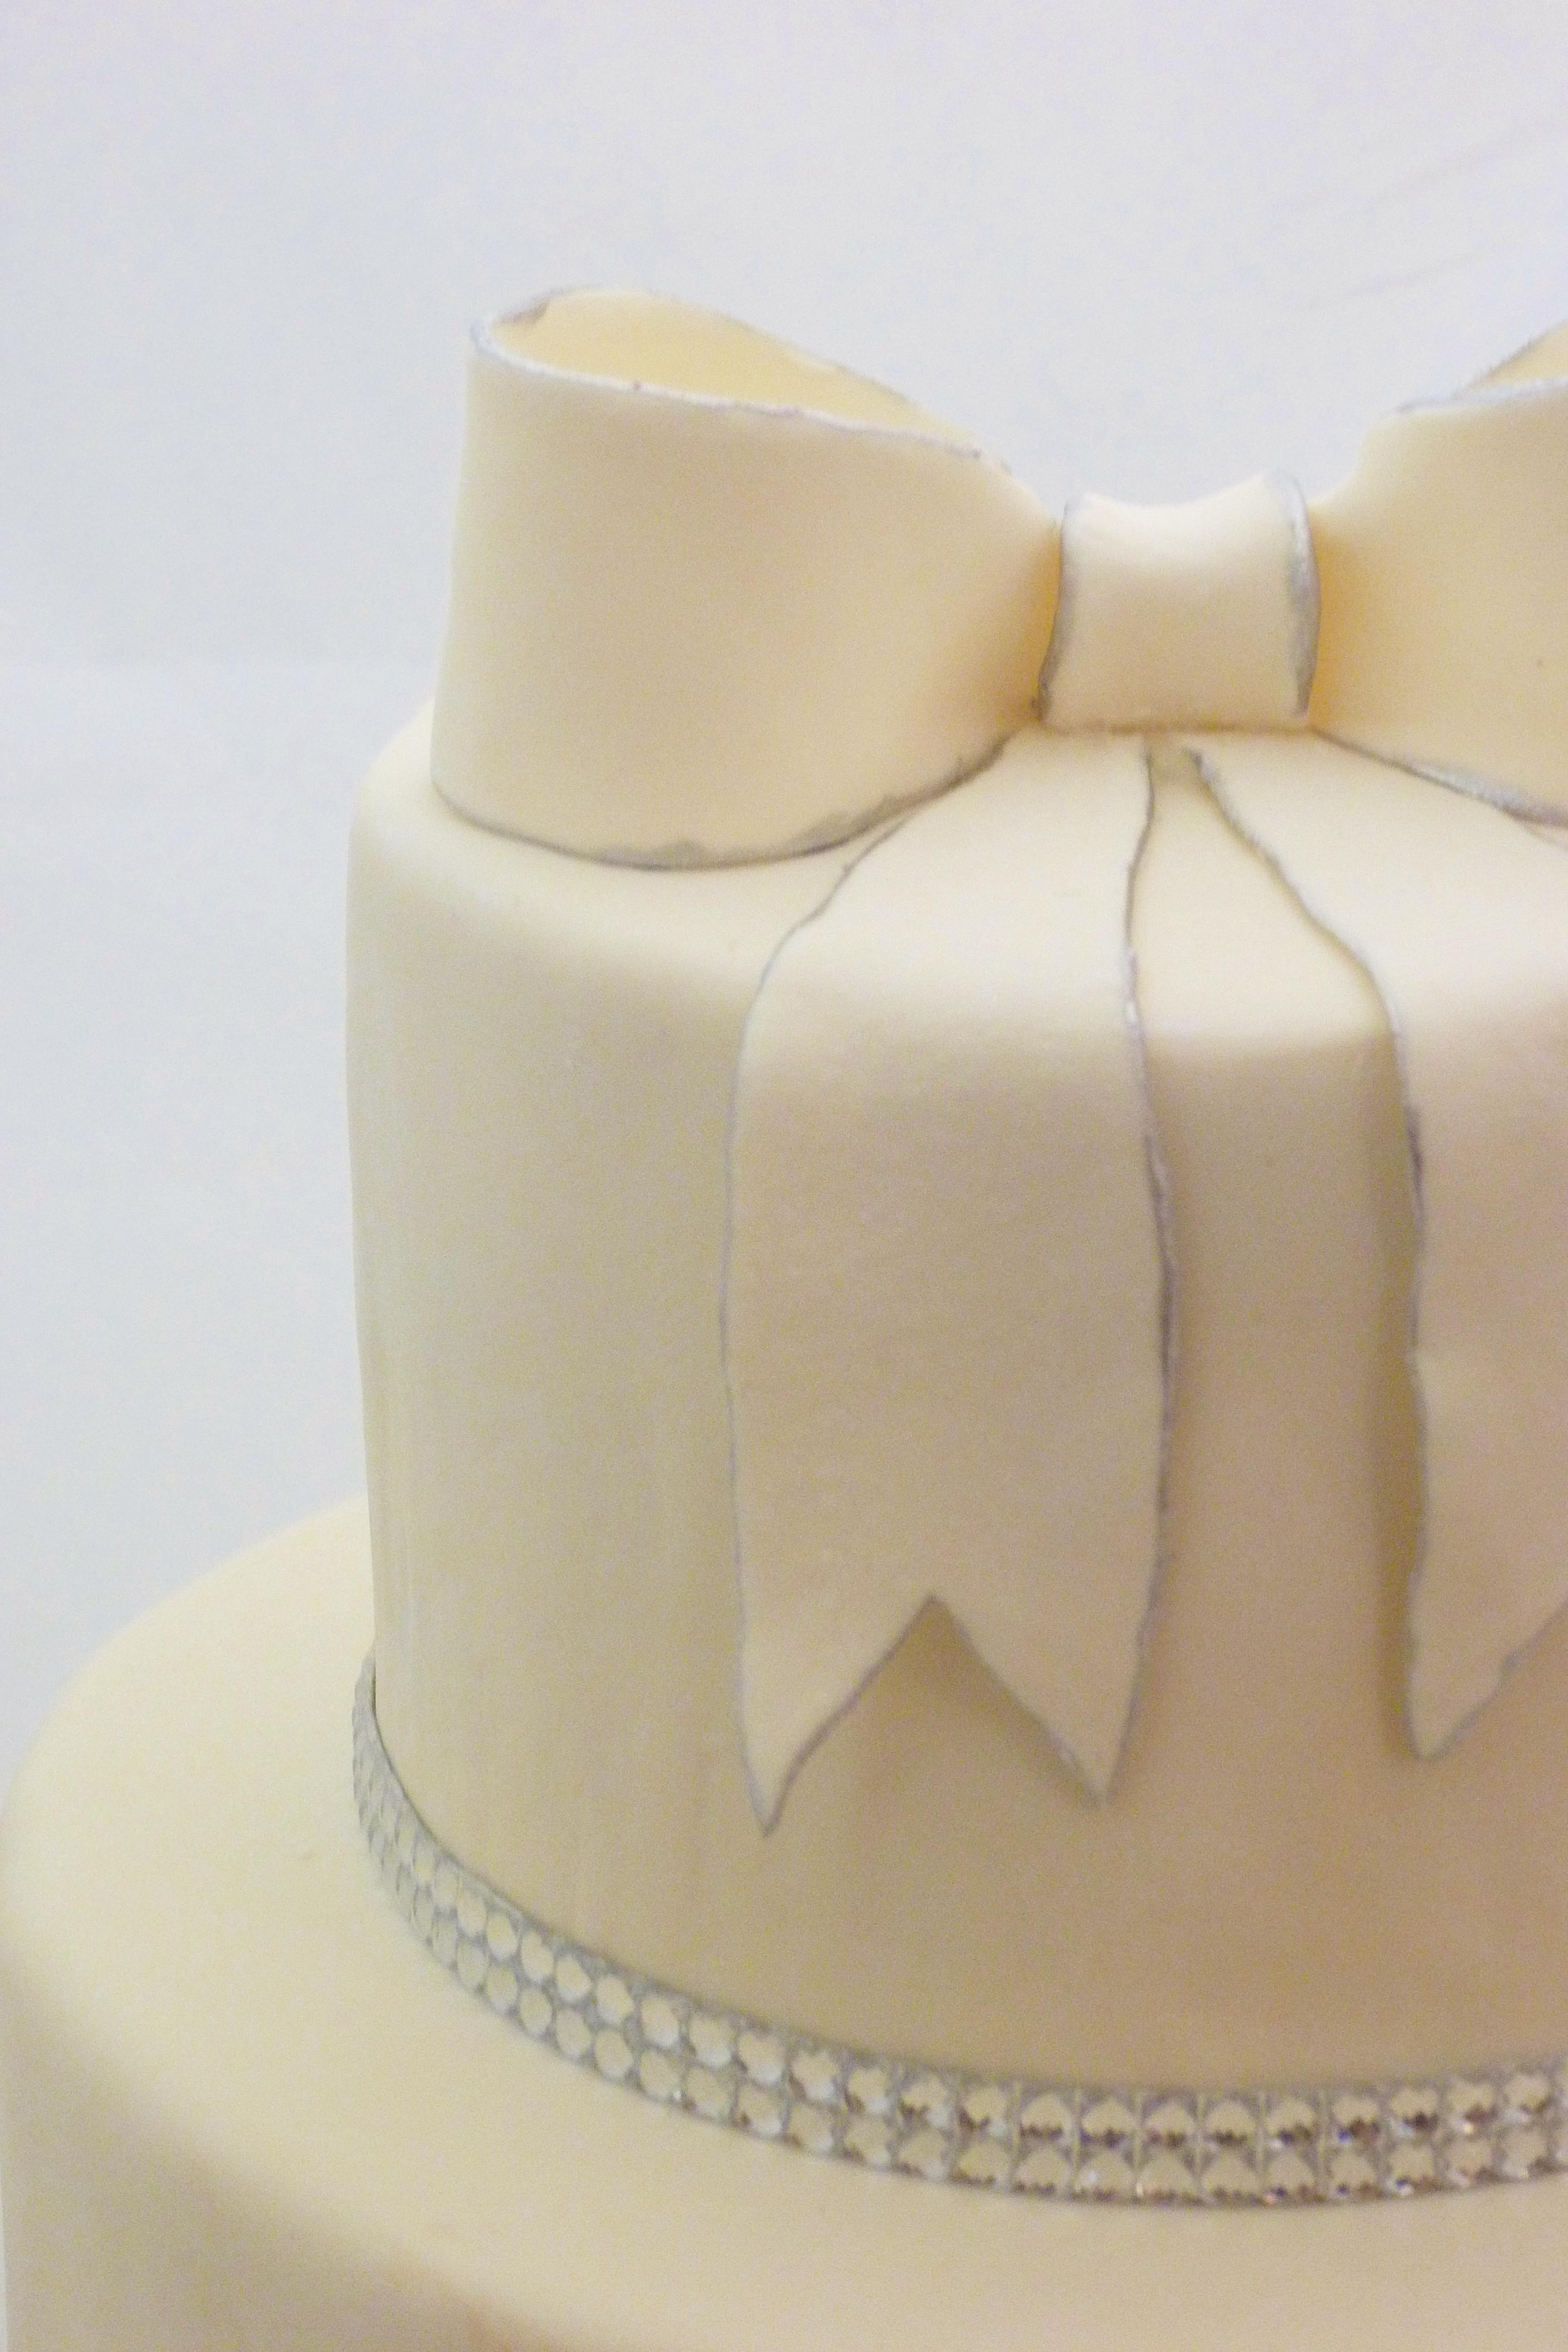 Elegant Round Wedding Cake With Fondant Silver Trim And Rhinestones